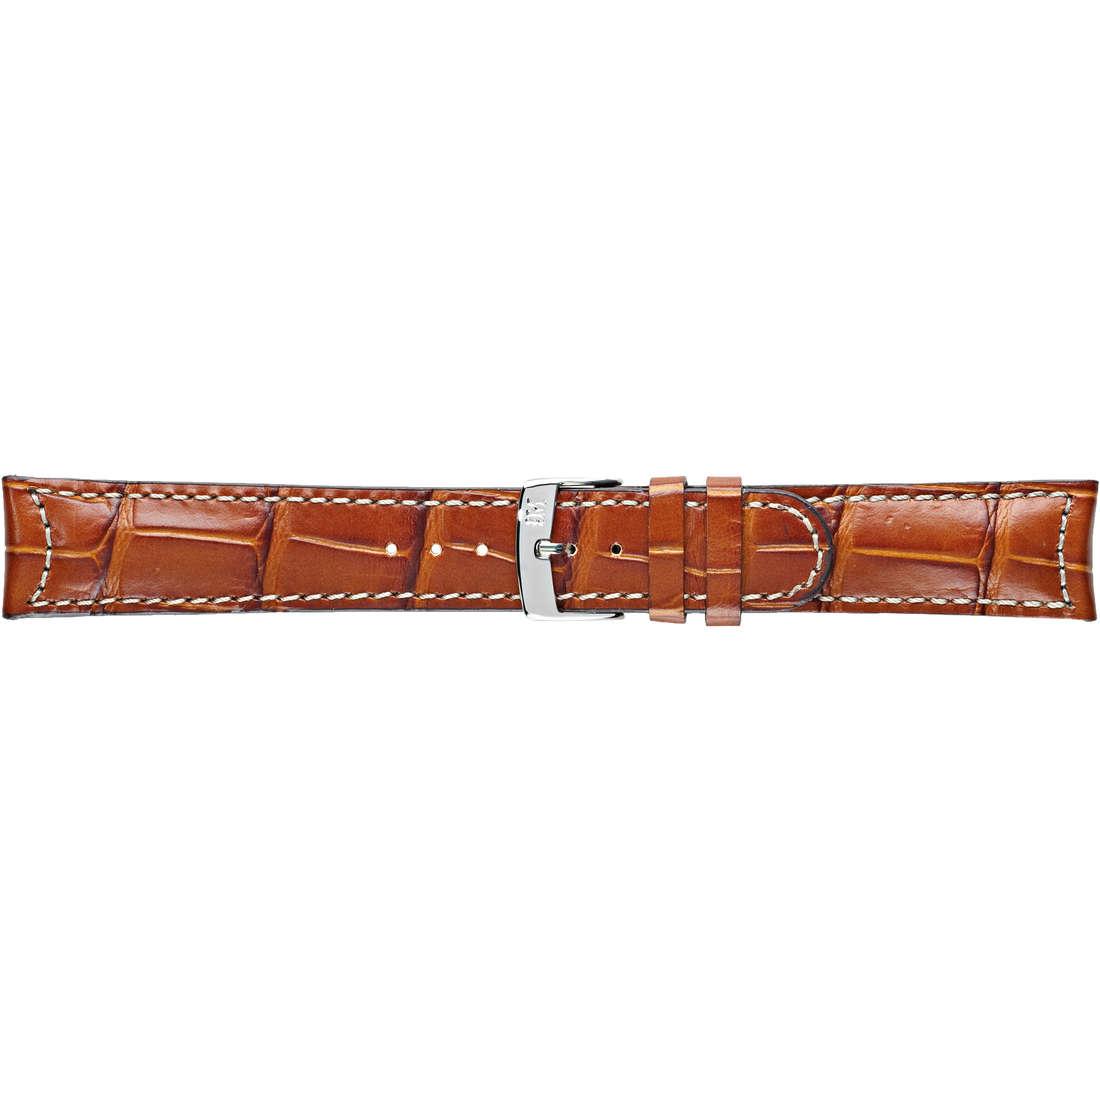 watch watch bands watch straps man Morellato Manufatti A01U3882A59041CR18